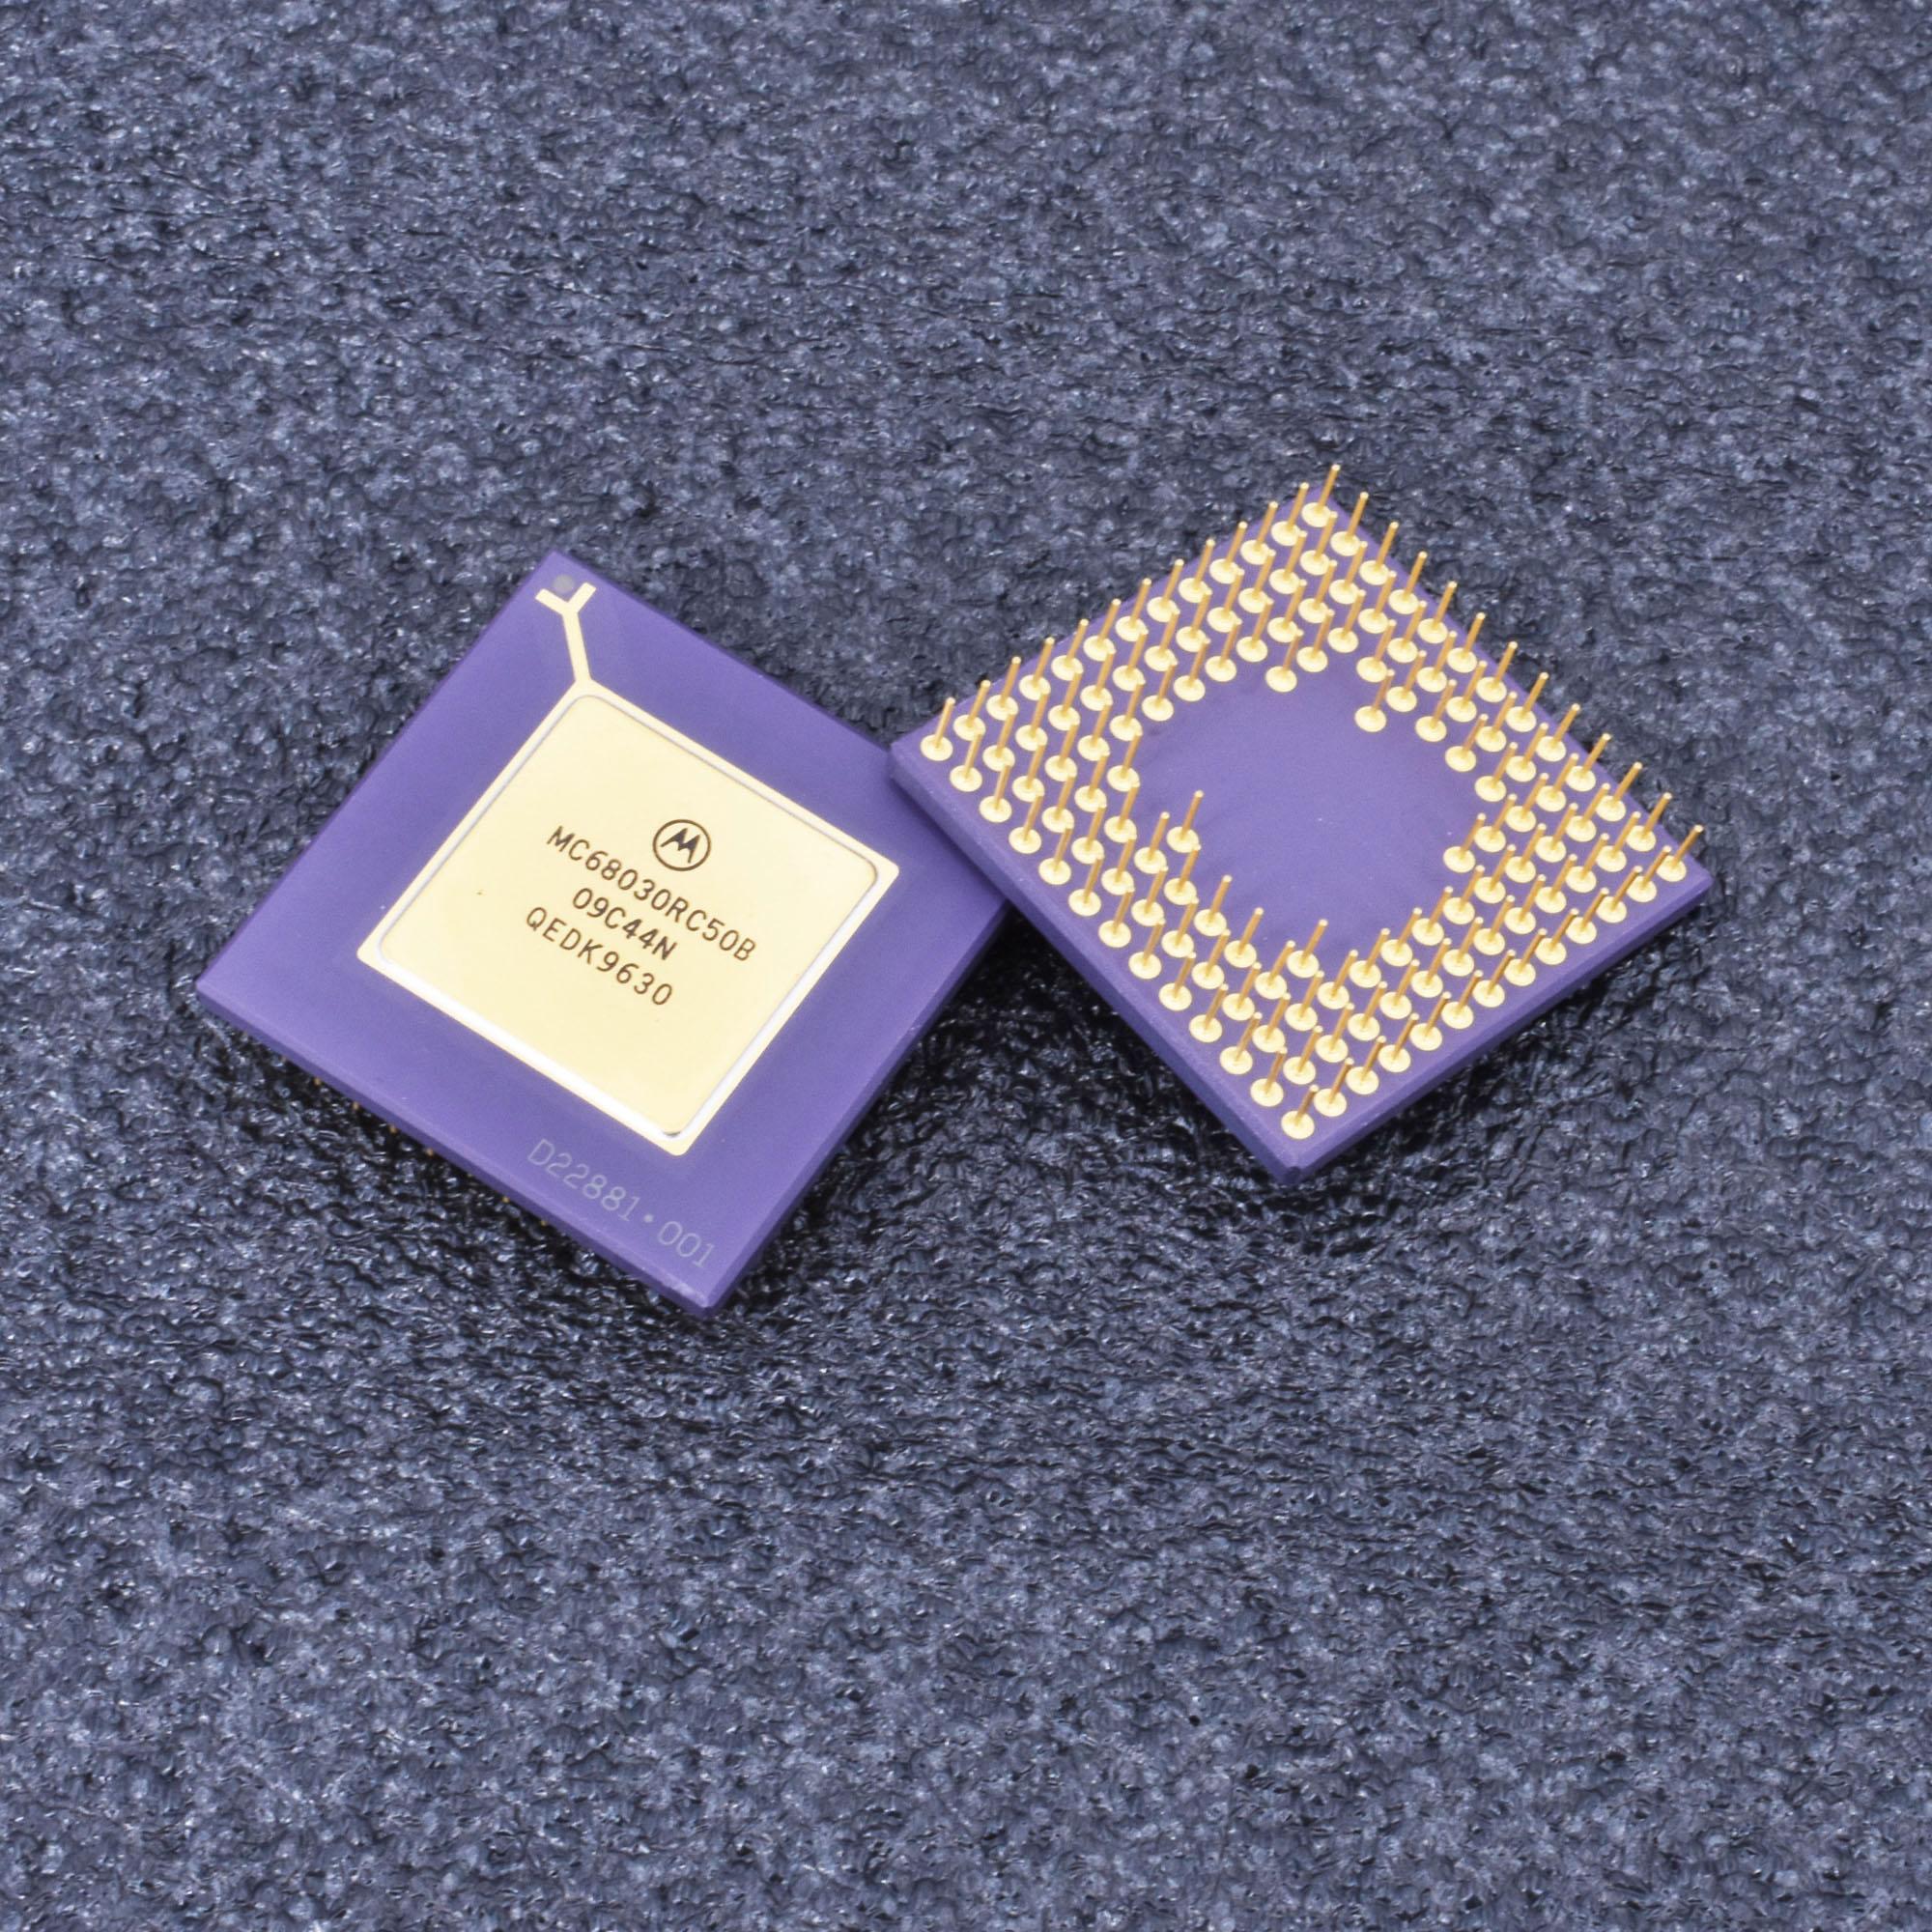 1PCS MC68030RC50B MC68030RC50 PGA 68030RC50B CPU MOTOROLA